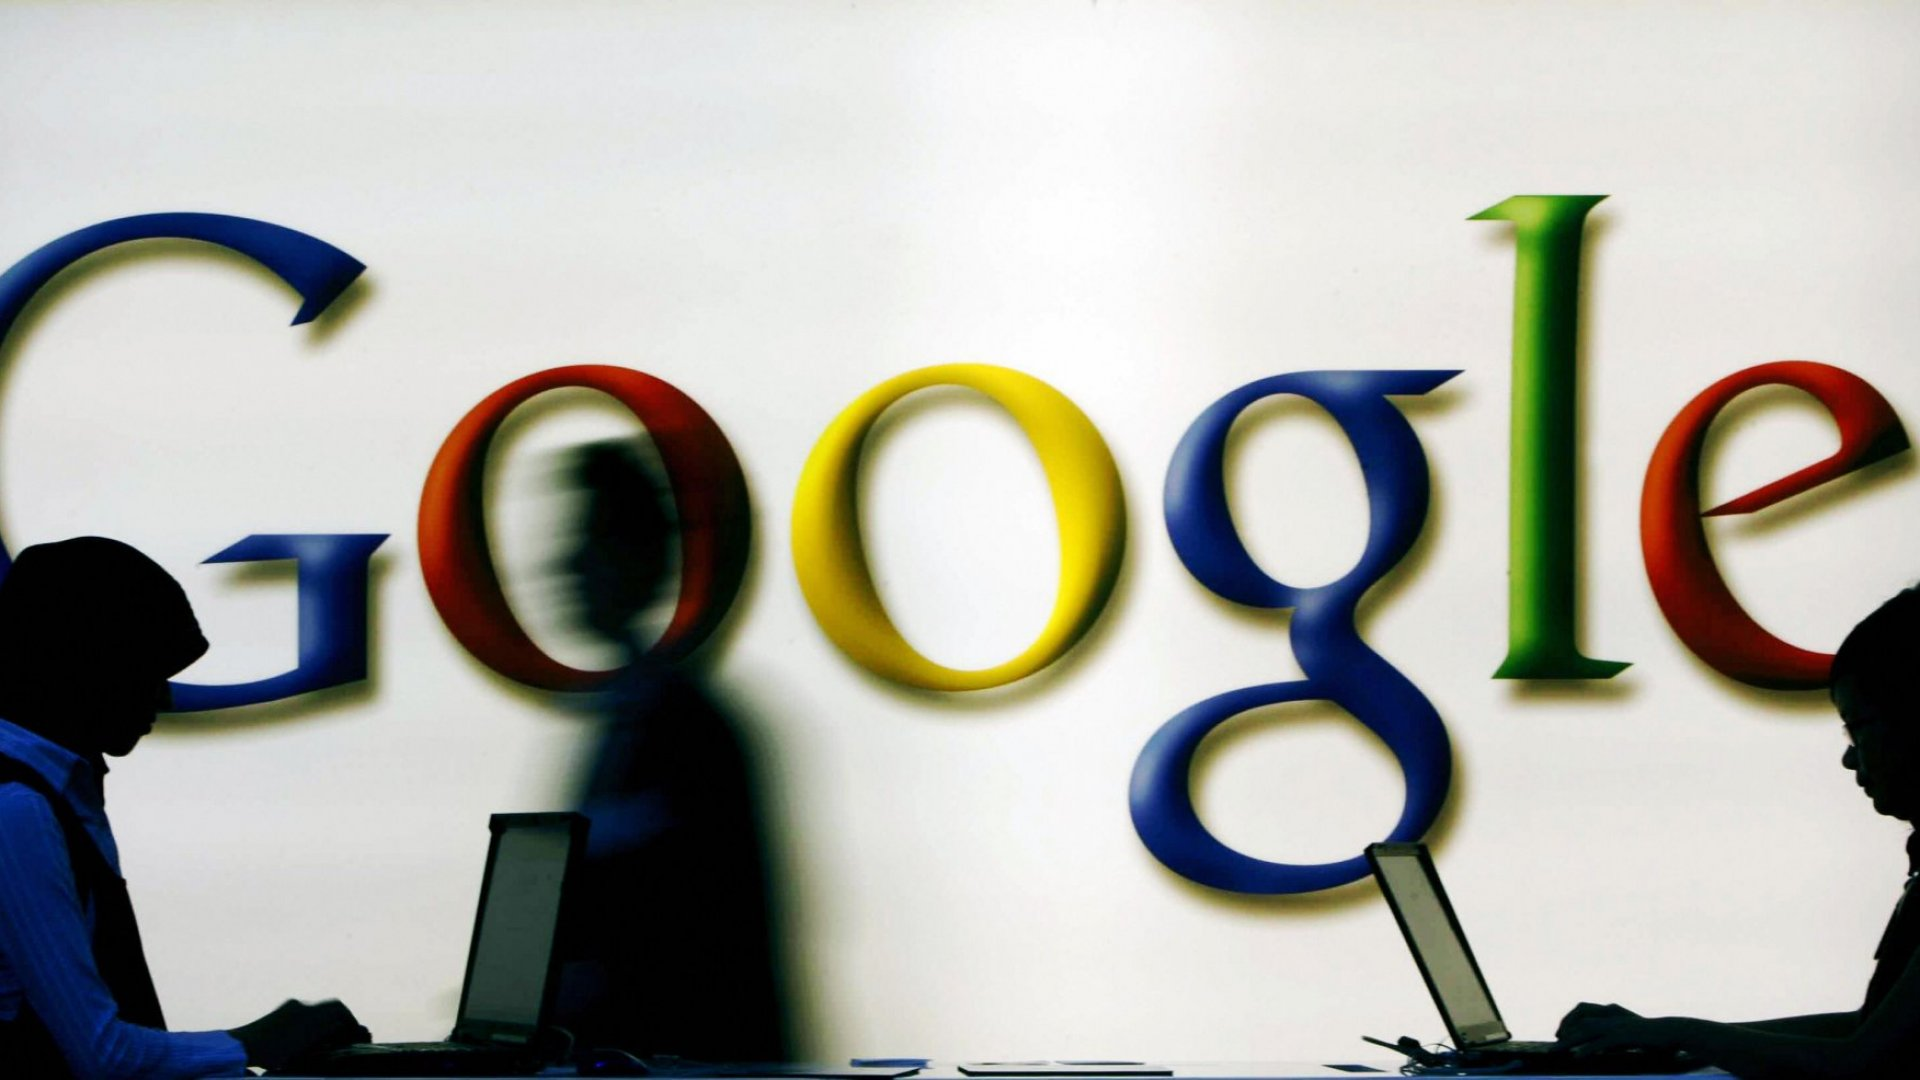 Women and Minorities Are Still Underrepresented at Google